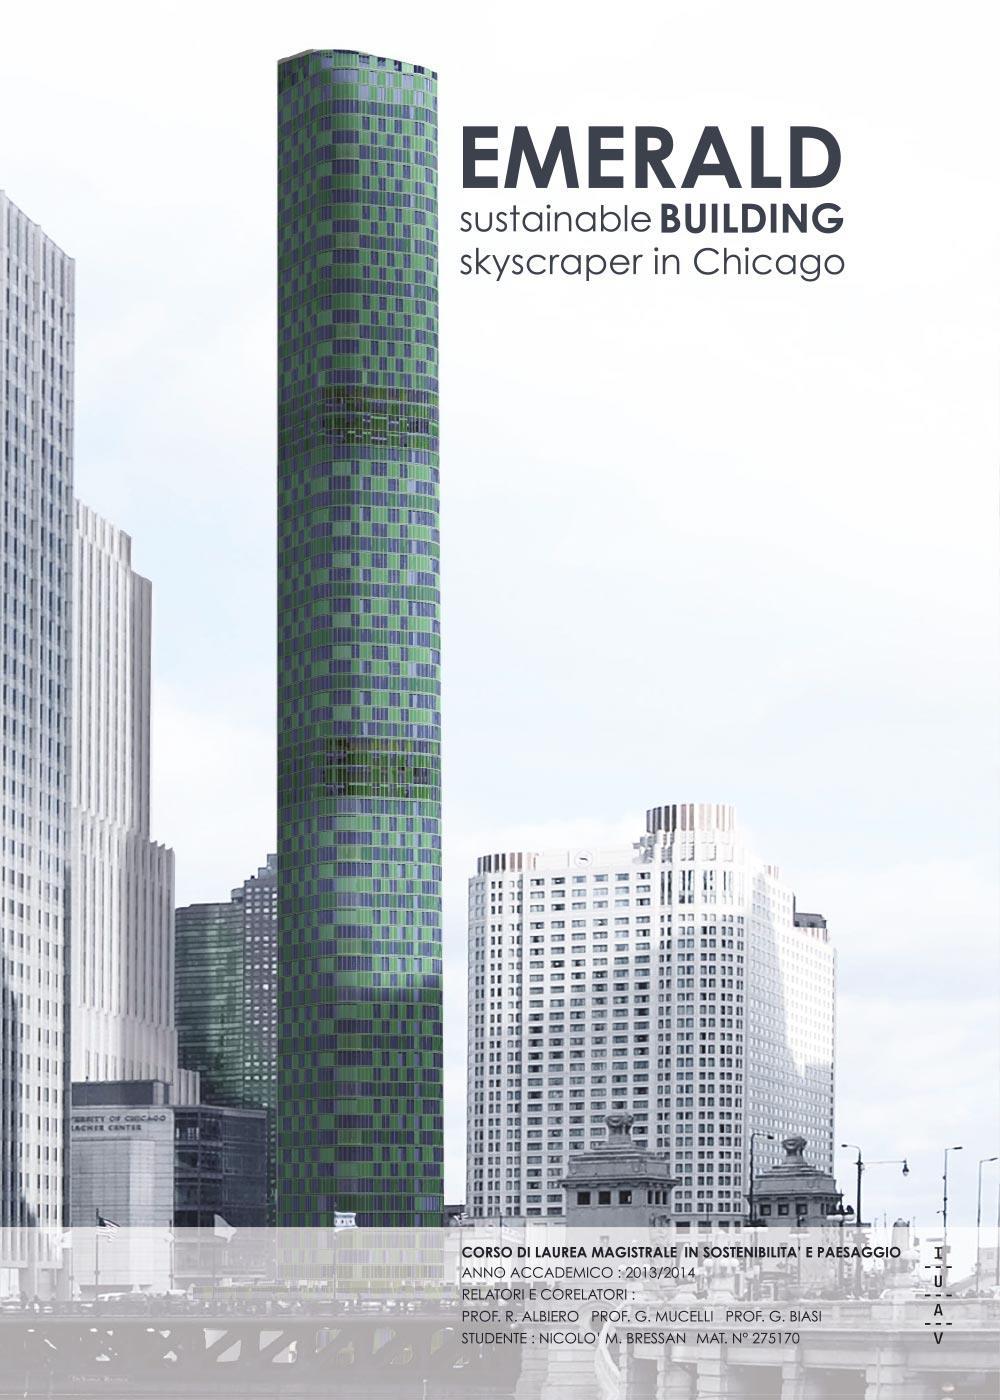 EMERALD sustainable building skyscraper in Chicago